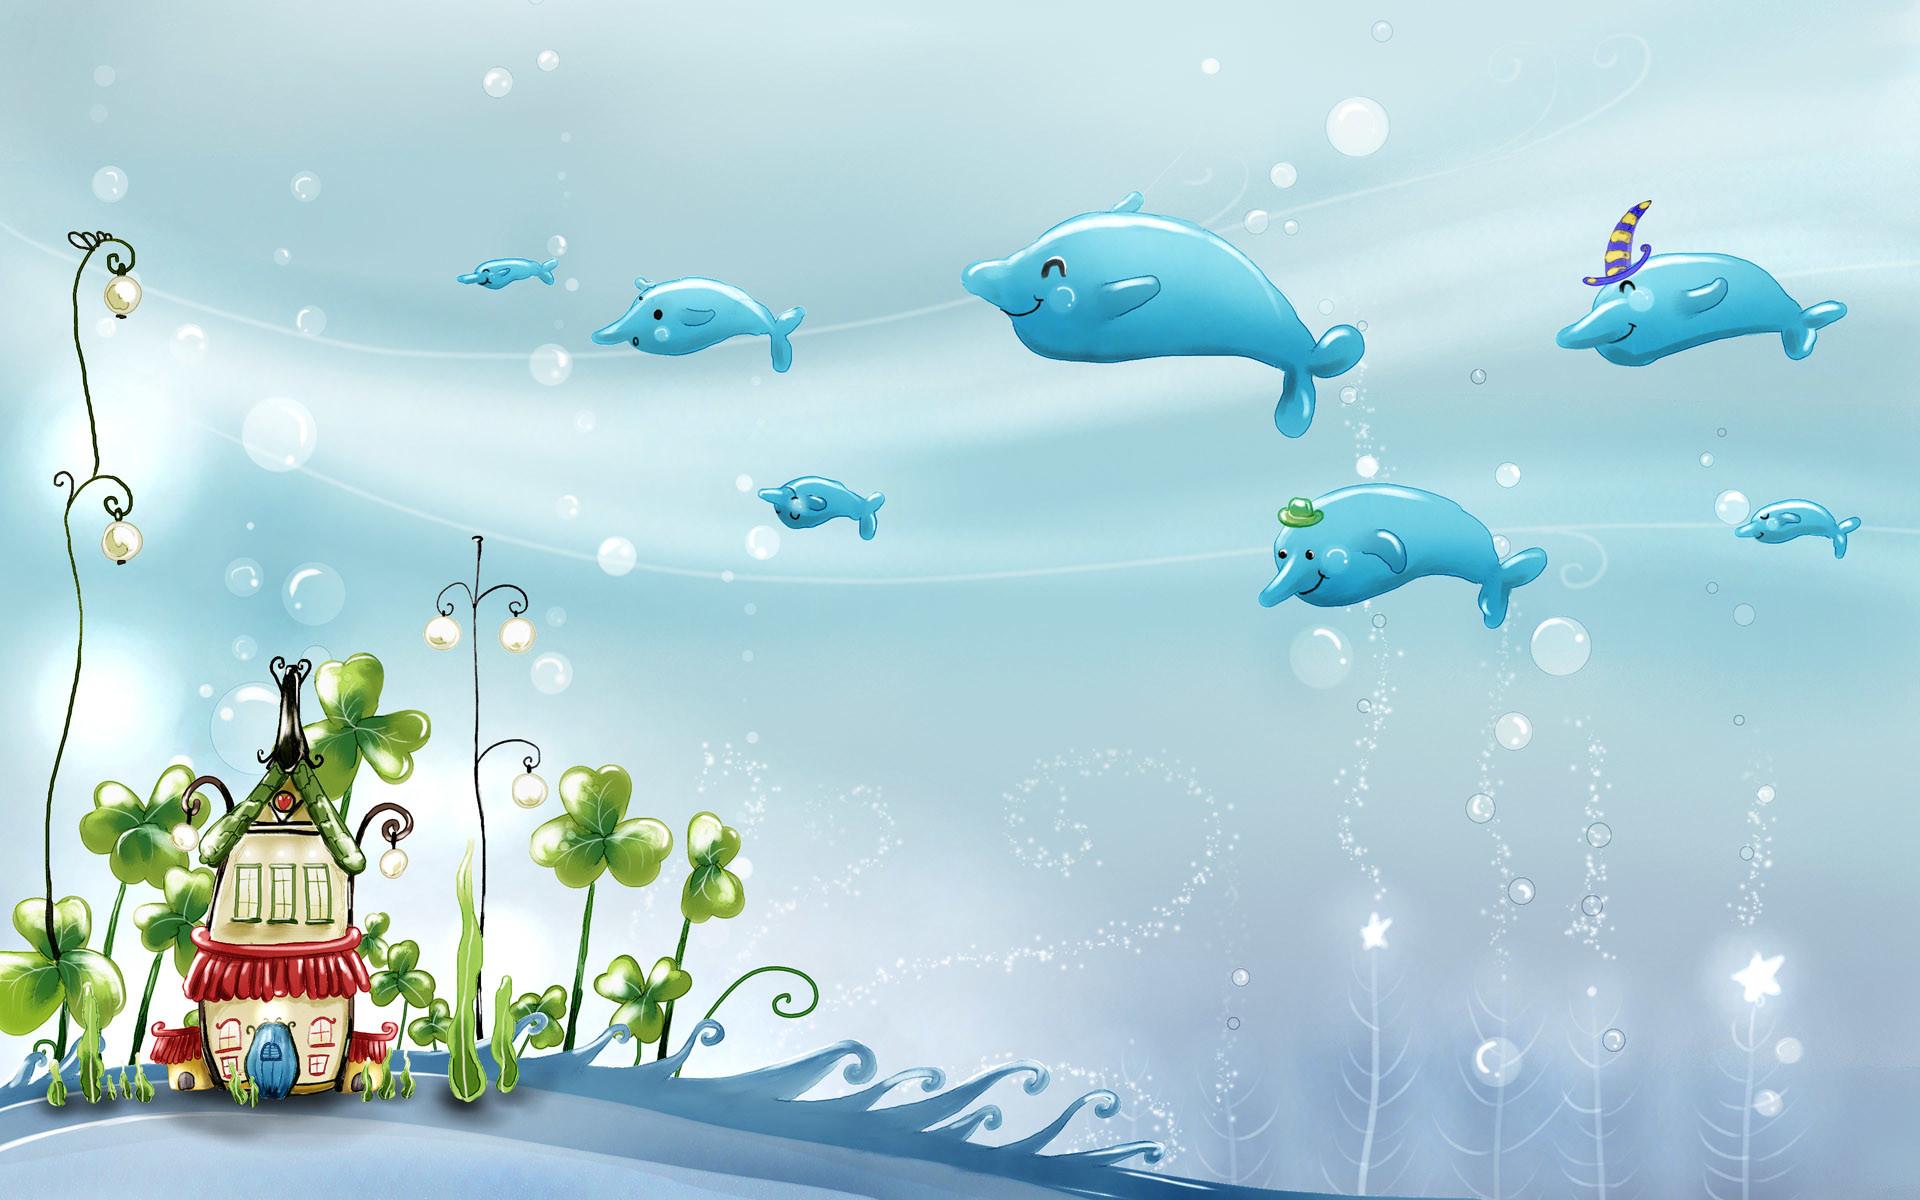 Cute Girl Cartoon Wallpaper images free download 1600×1200 Cute Cartoon  Wallpaper (48 Wallpapers